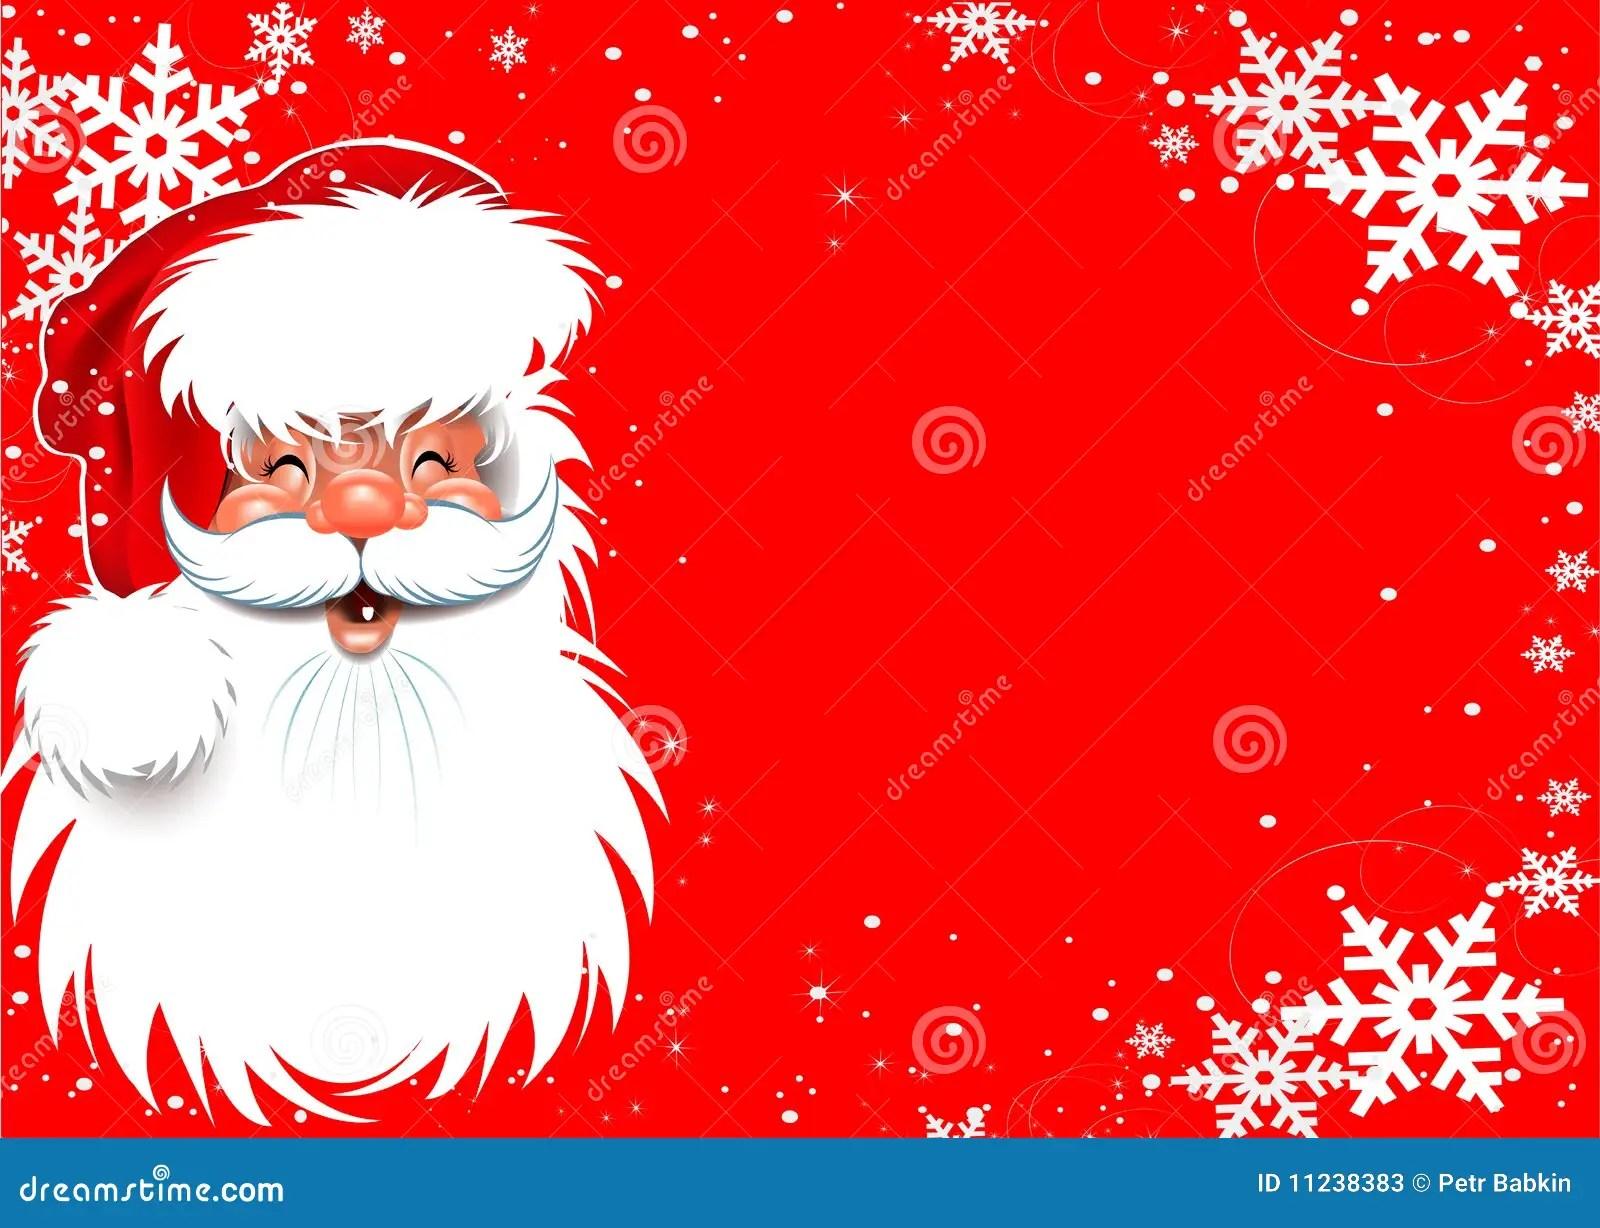 Free Xmas Wallpapers Animated Fundo Do Natal De Papai Noel Ilustra 231 227 O Do Vetor Imagem